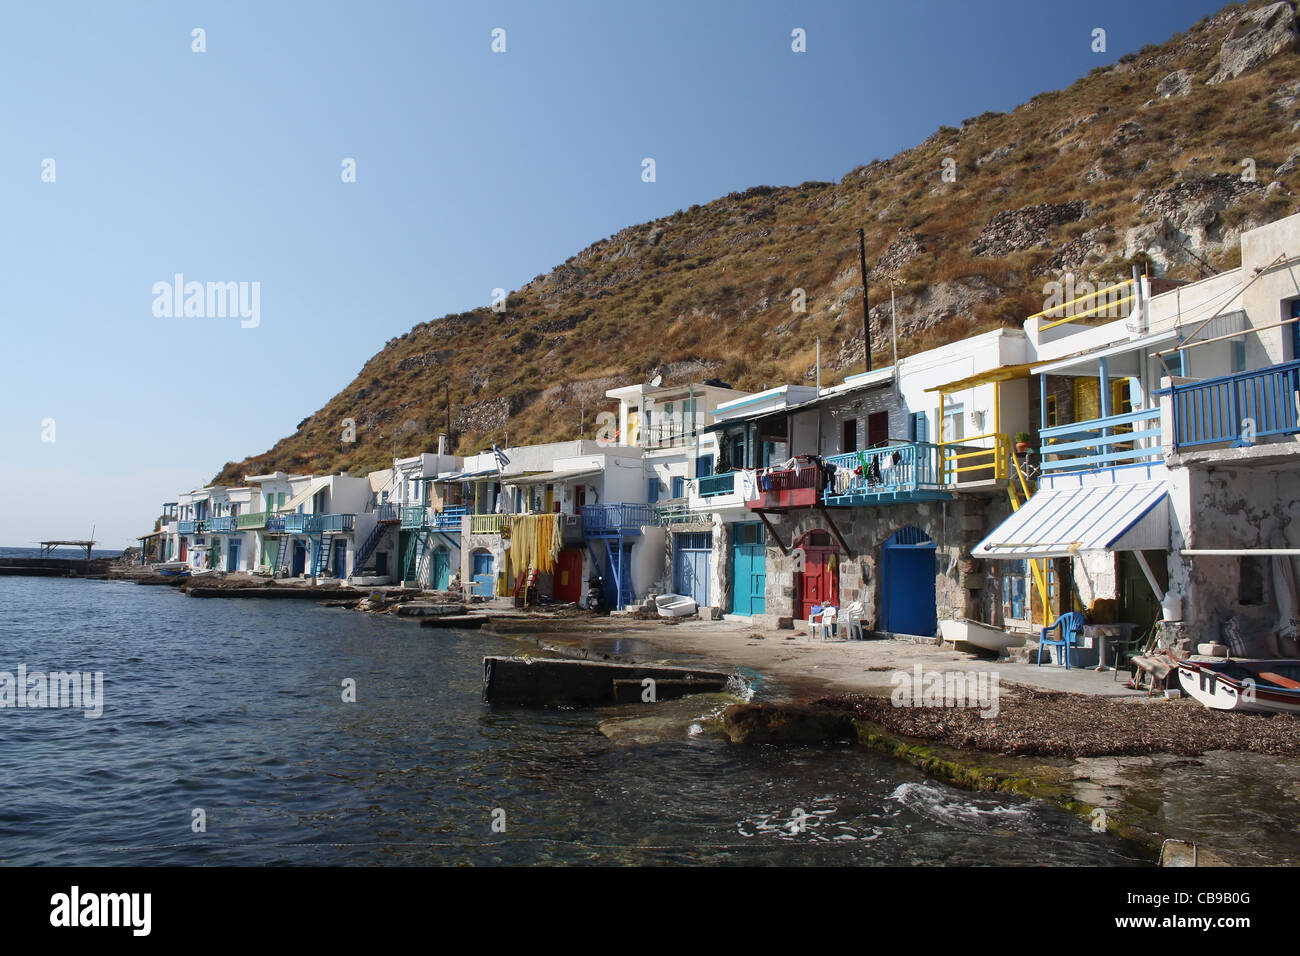 Little harbor of Klima, Milos island, Greece - Stock Image